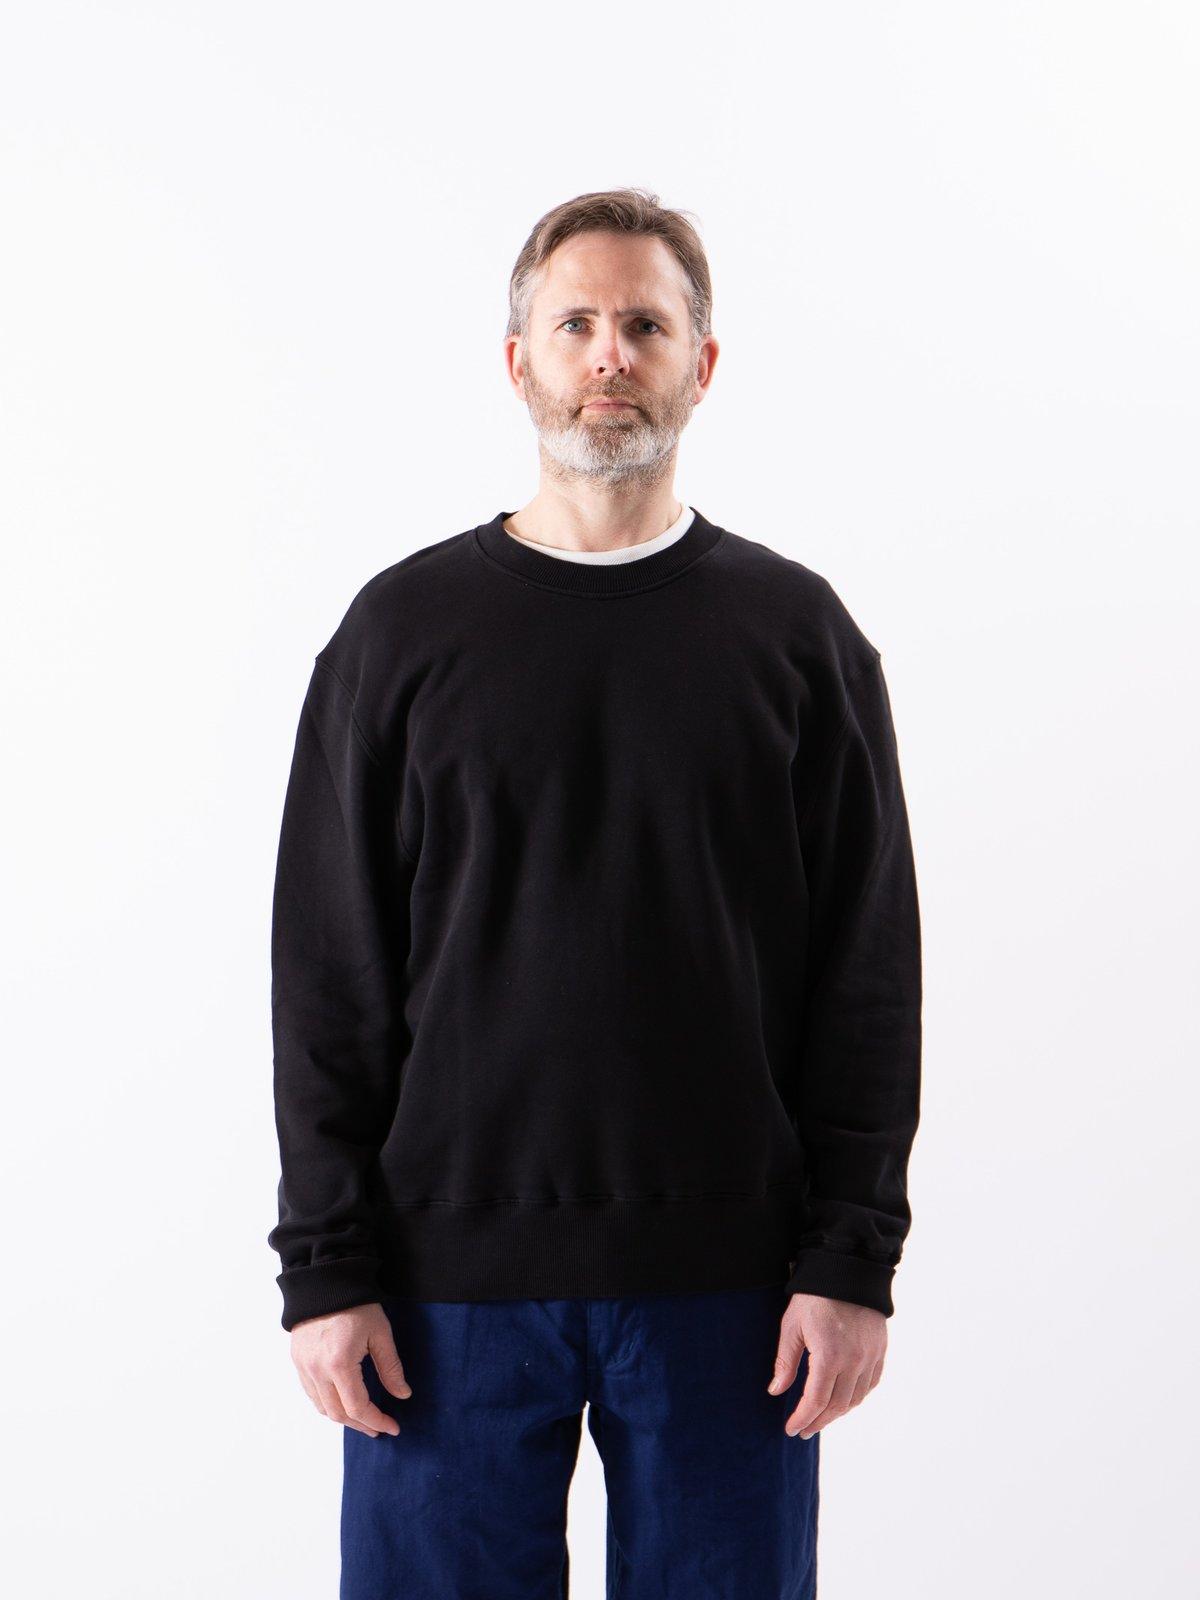 Deep Black Good Basics CSWOS01 Oversized Crew Neck Sweater - Image 2